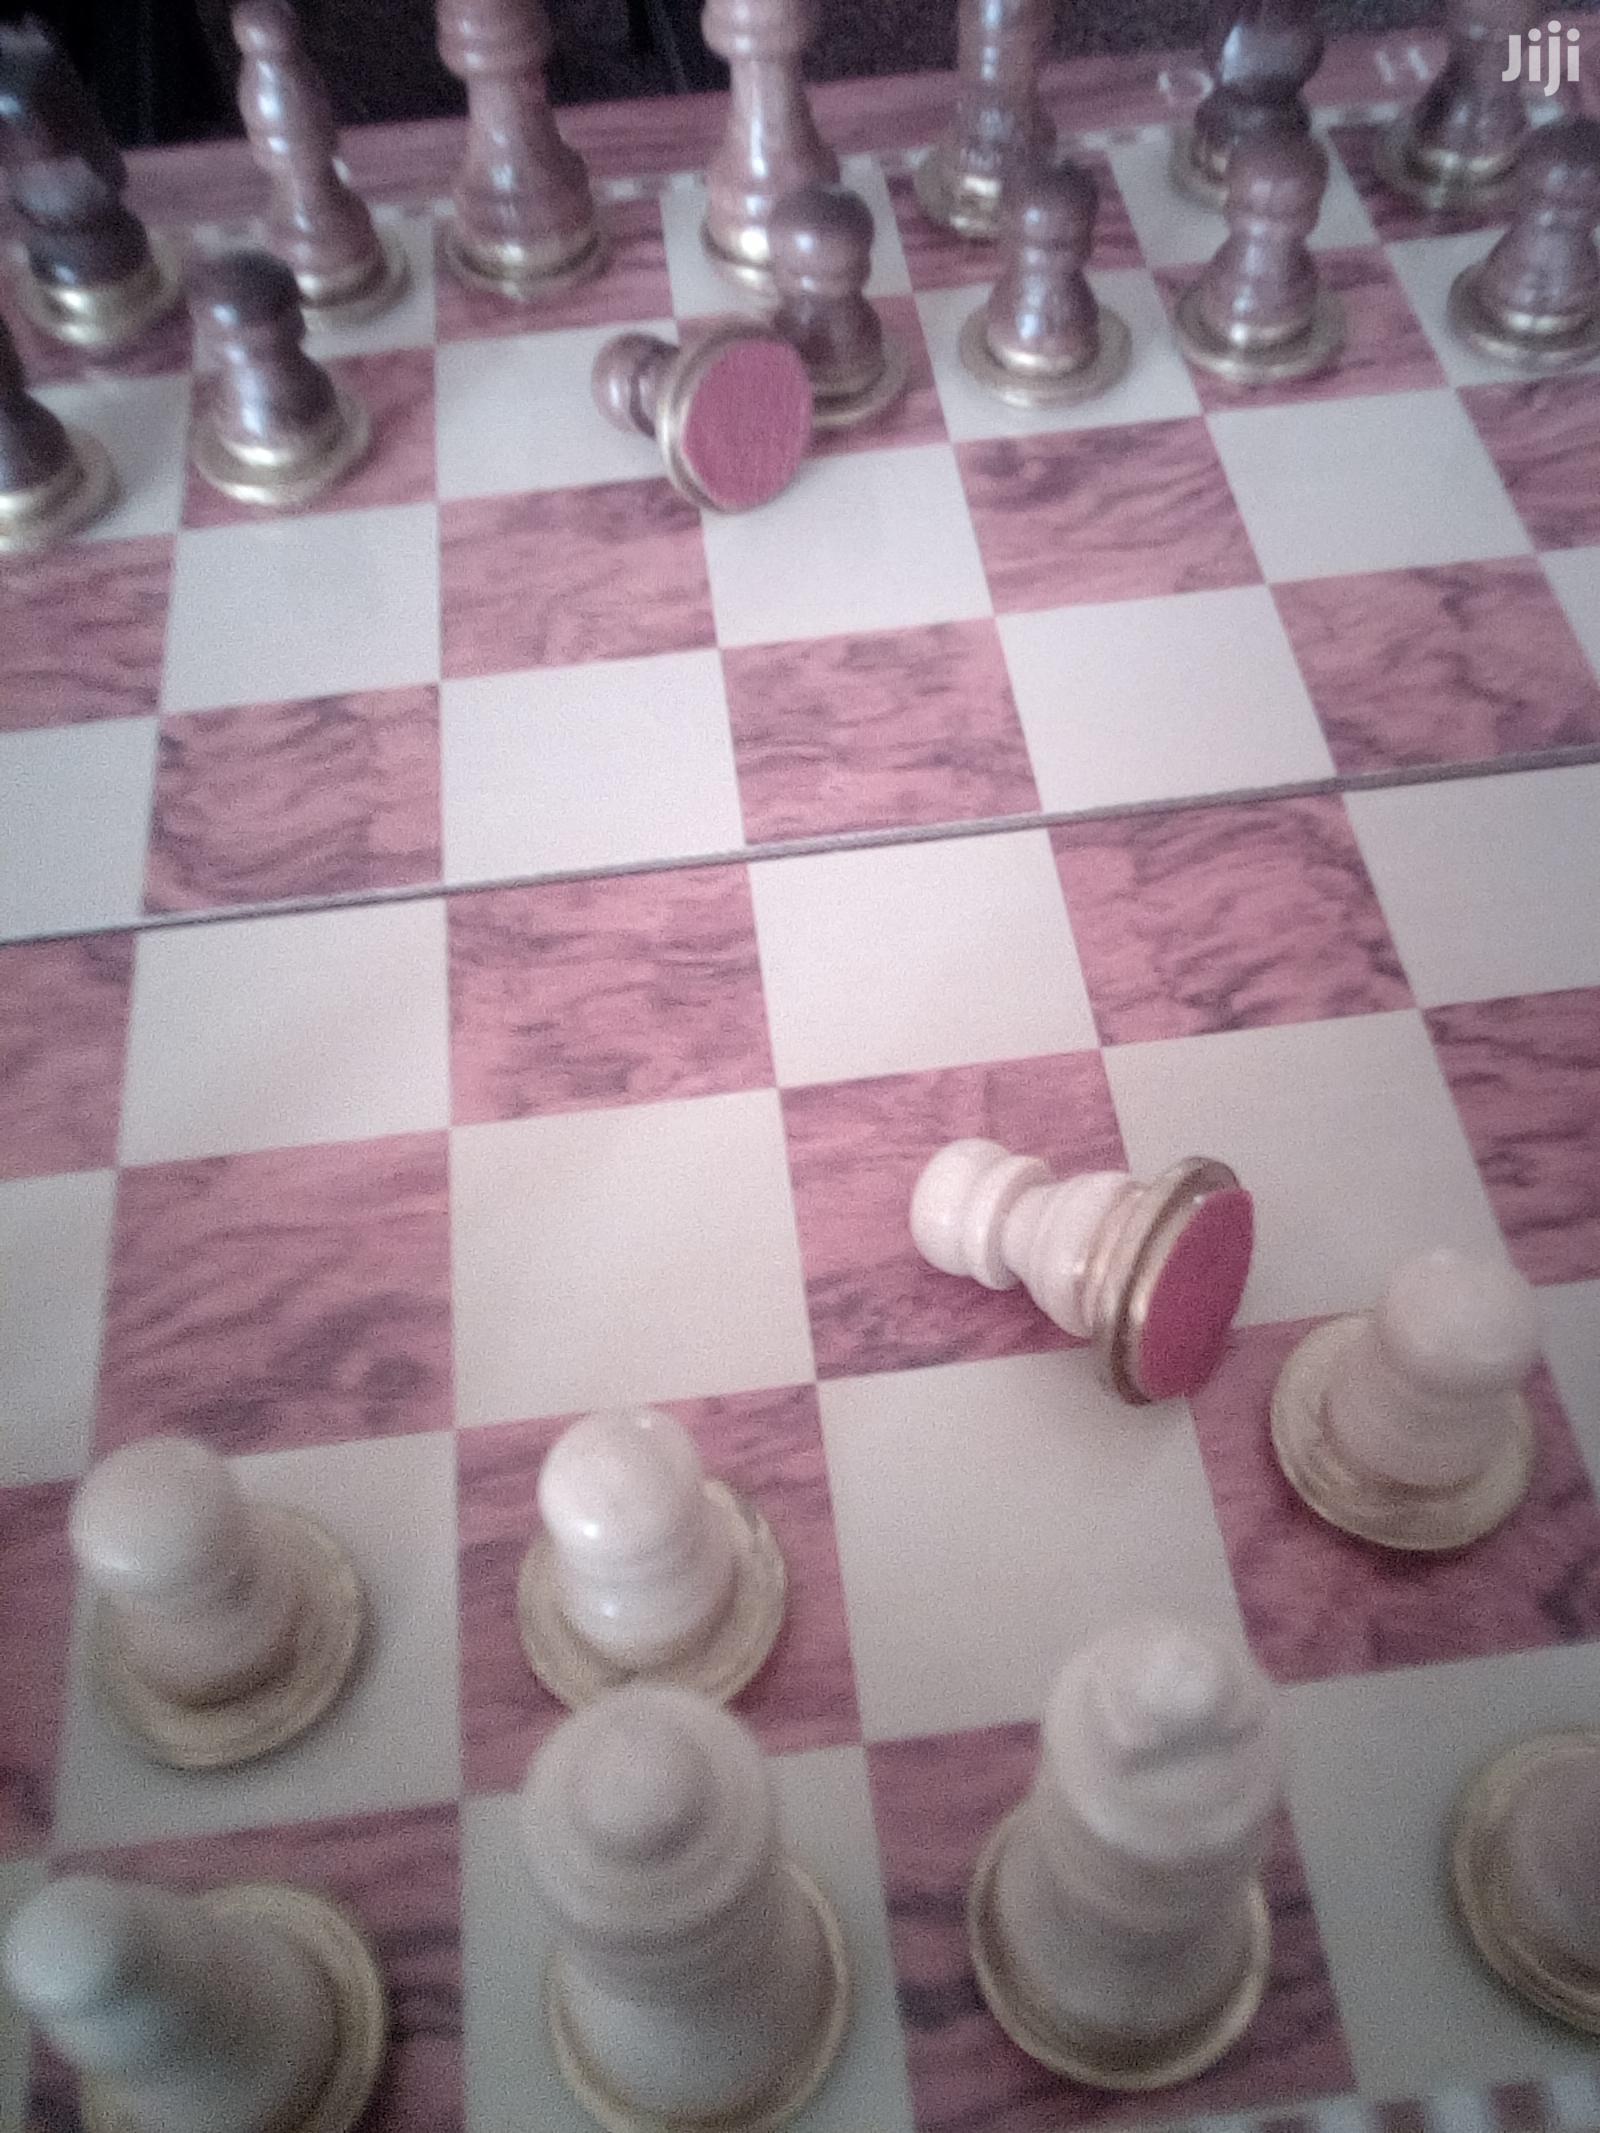 Chess Checkers Backgammon Set 3 In 1